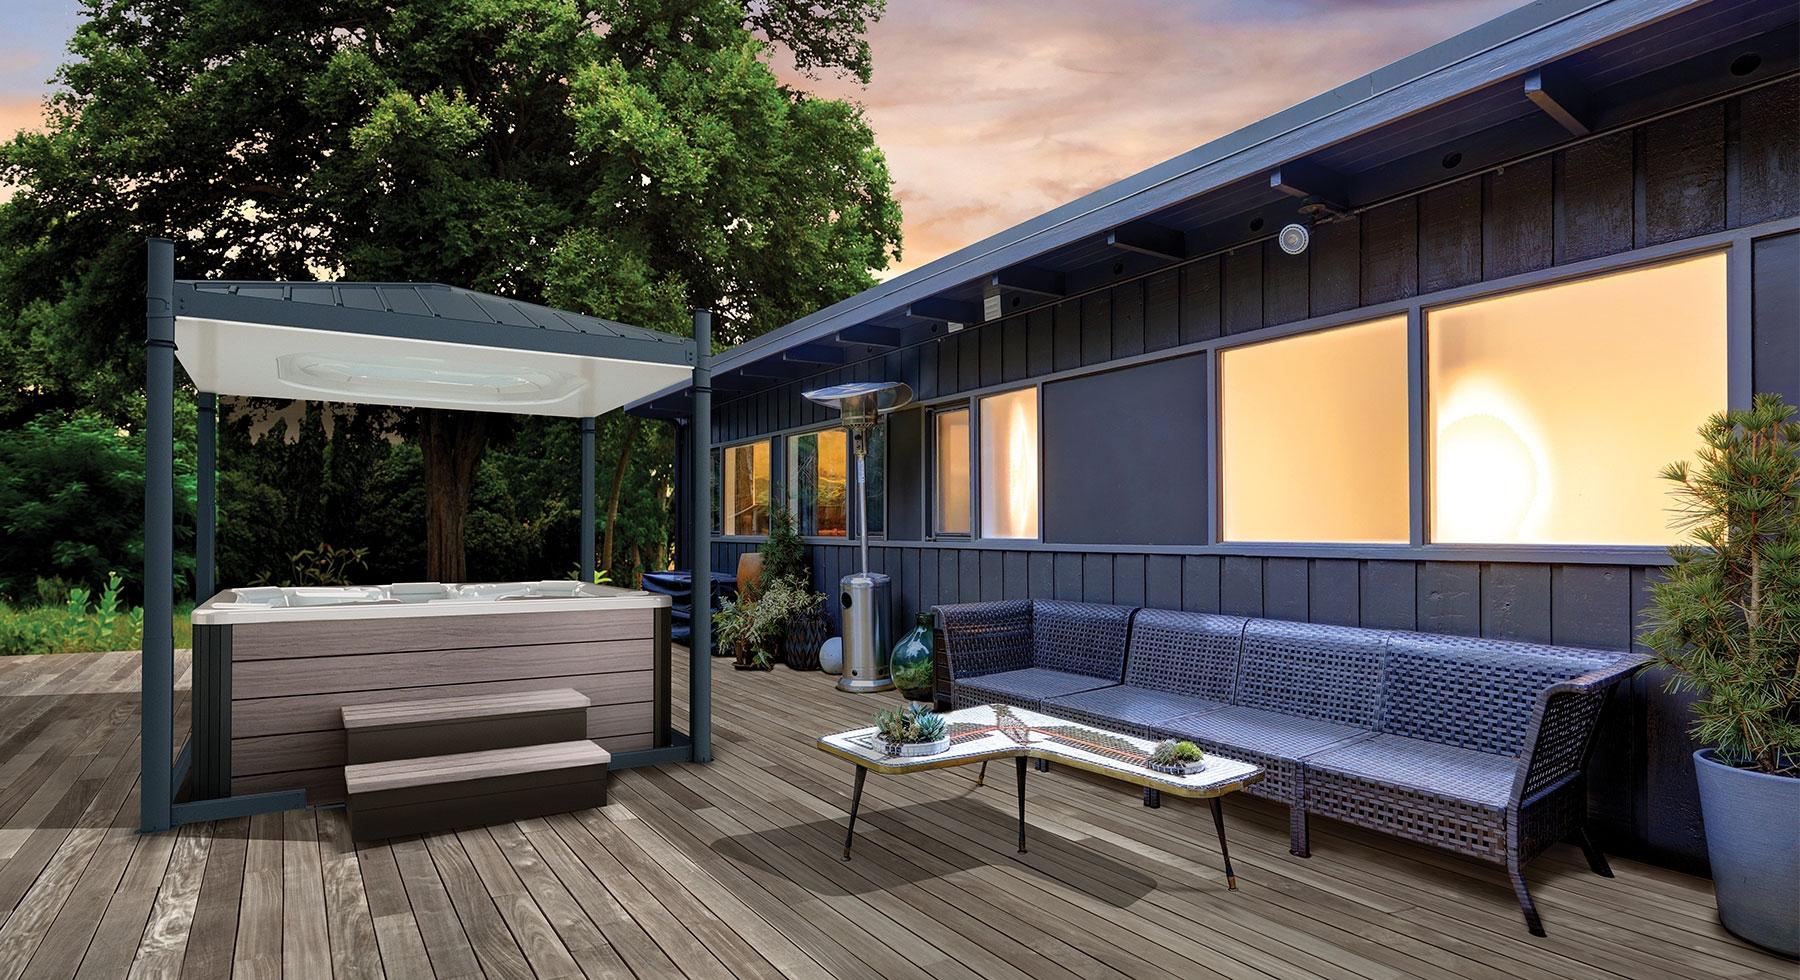 gazebo-oasis-spa-ouvert-store-semi-opaque-pare-soleil